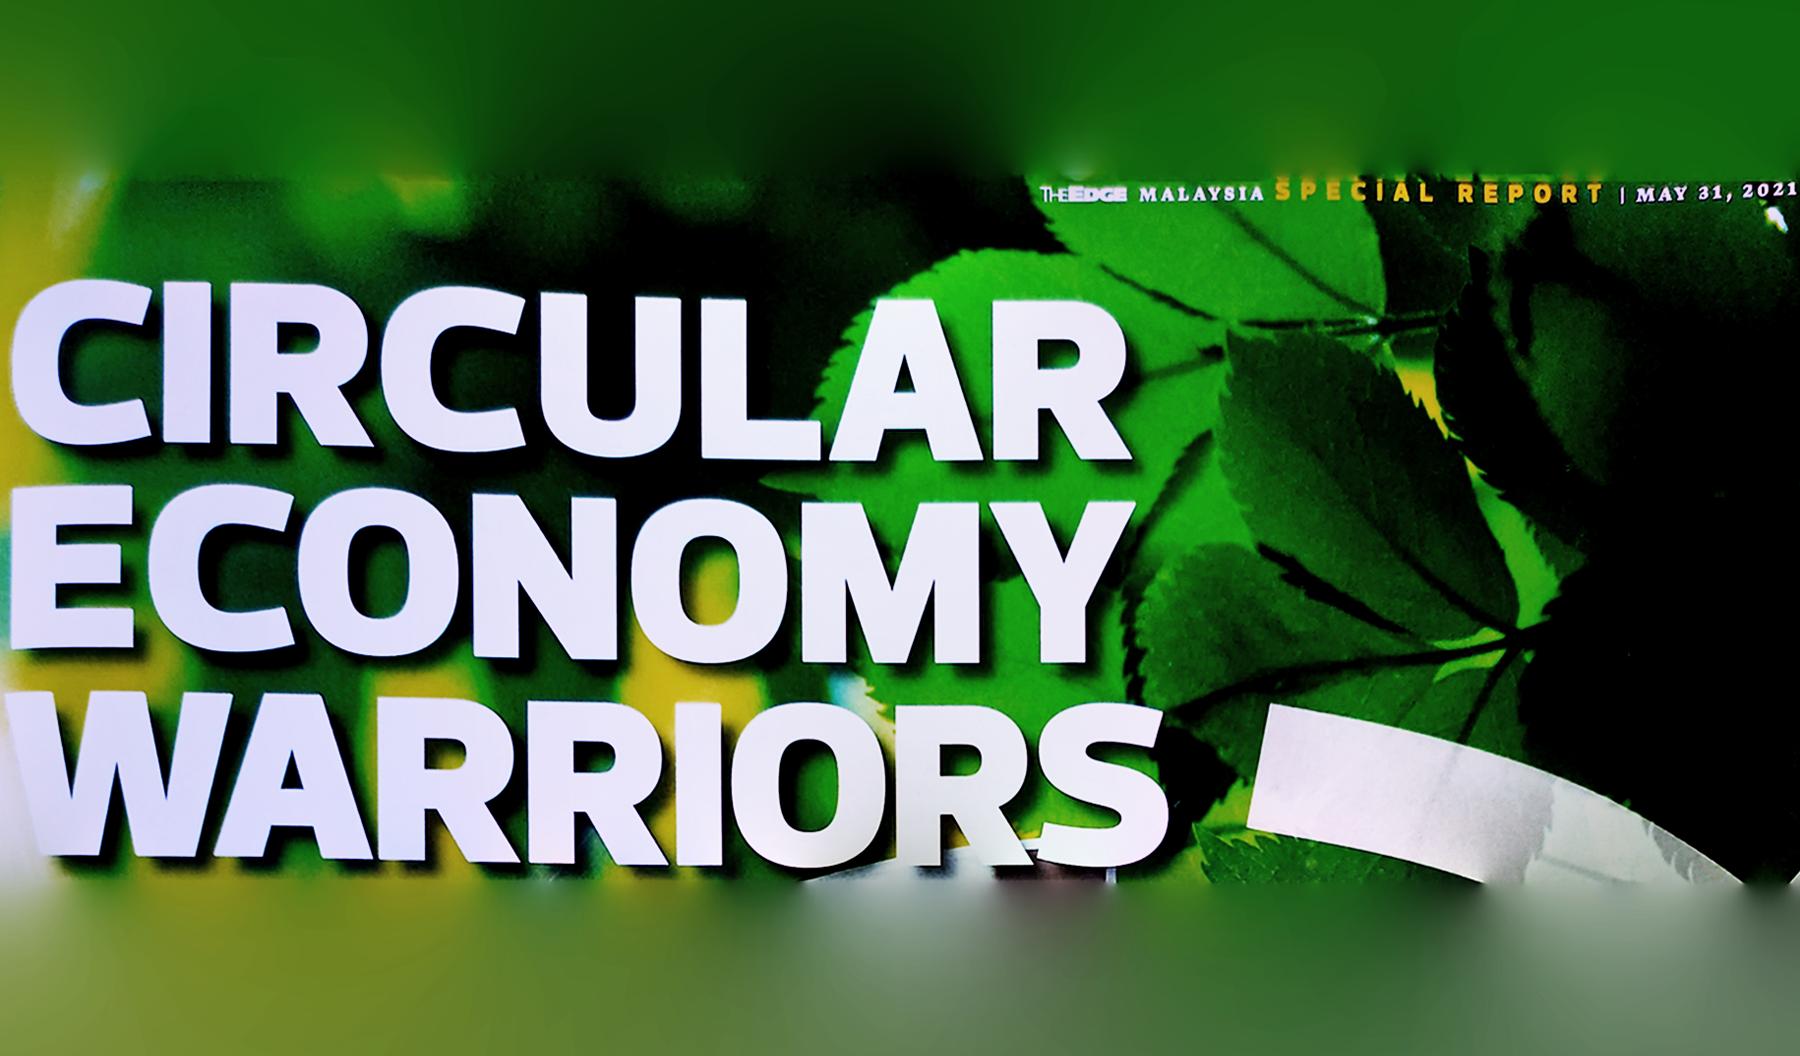 Circular economy warriors-banner